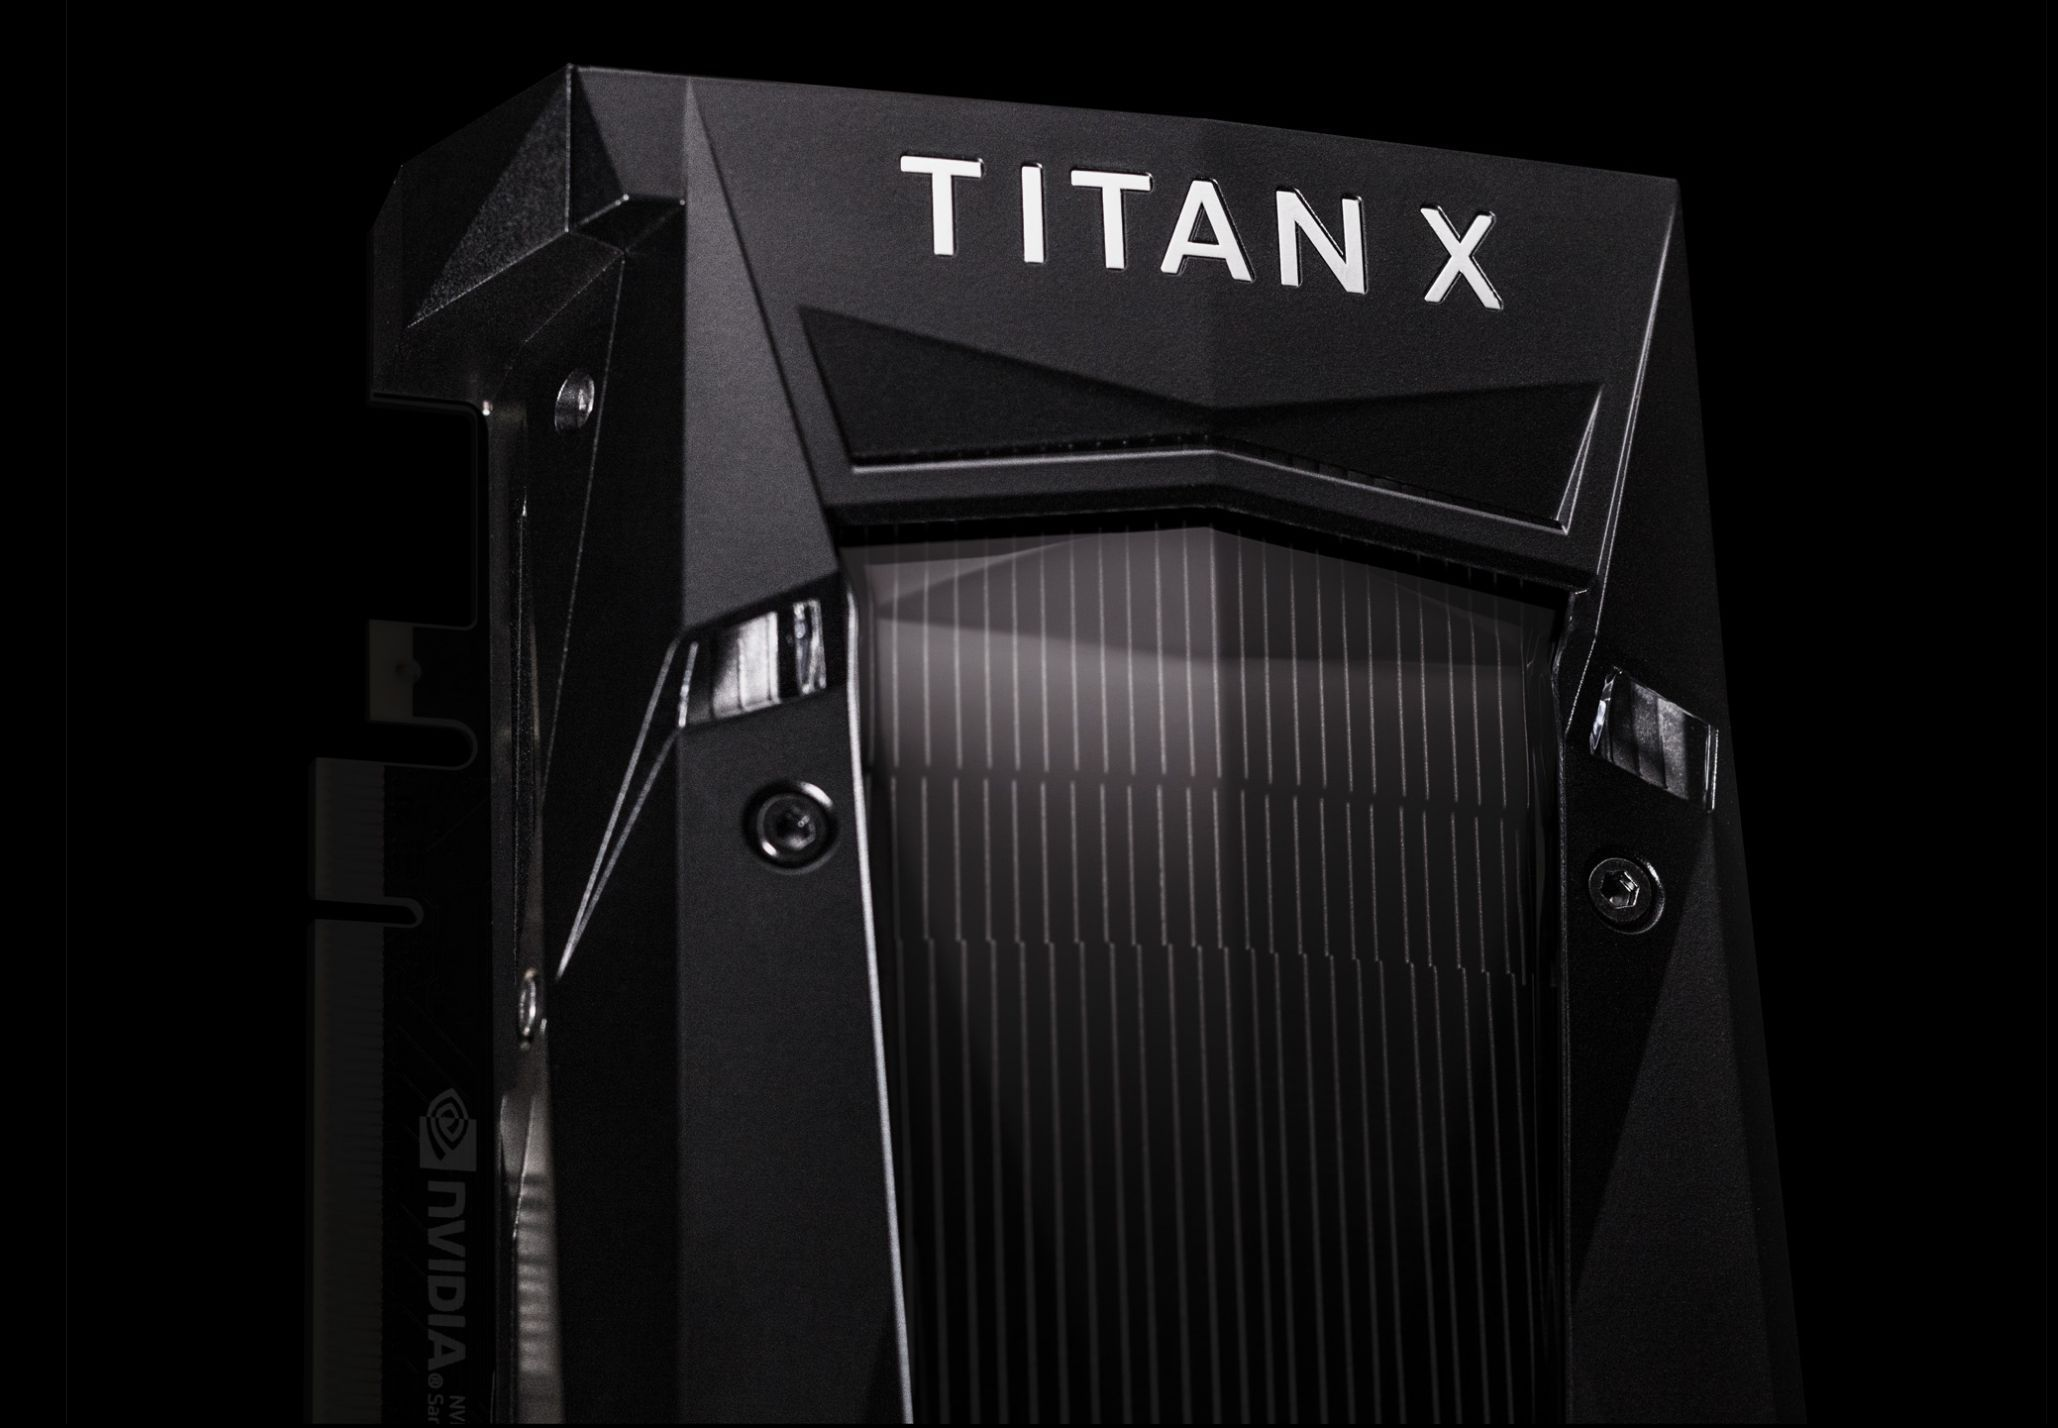 nvidia-geforce-titan-xp-glamor-100716938-orig